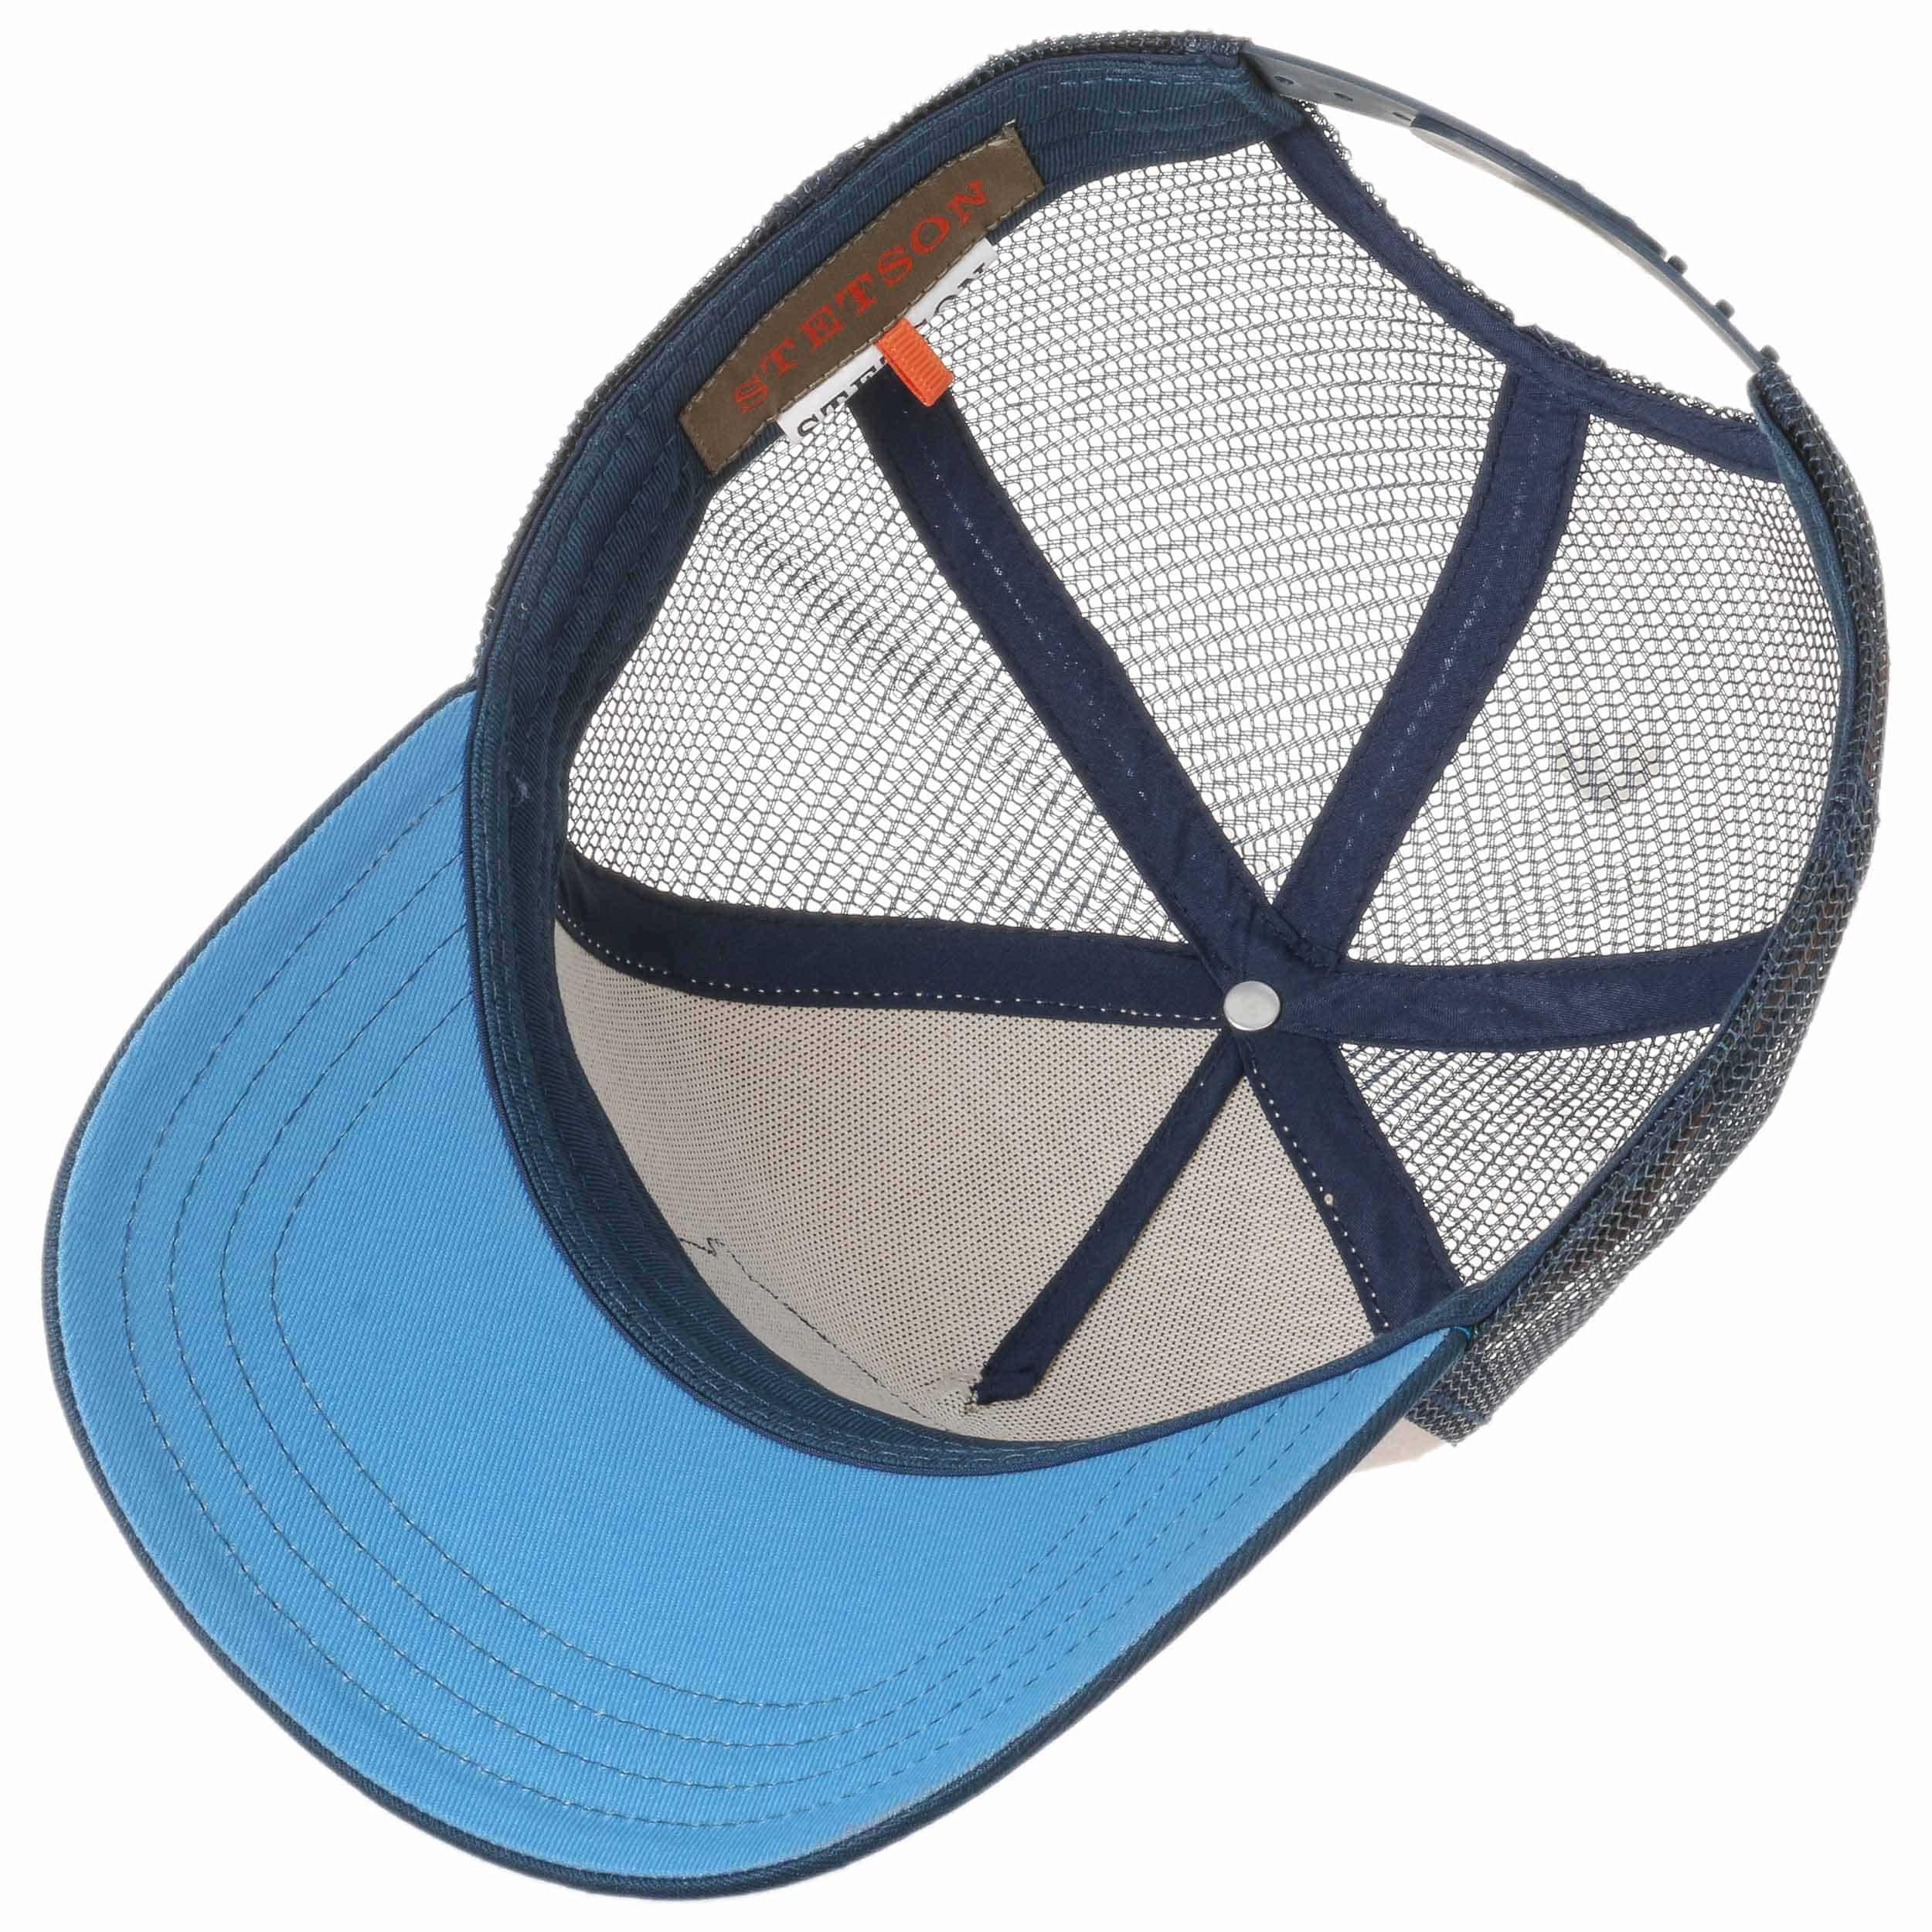 ... Cappellino Trucker Baseball by Stetson - blu scuro 2 ... c8be5b70a948